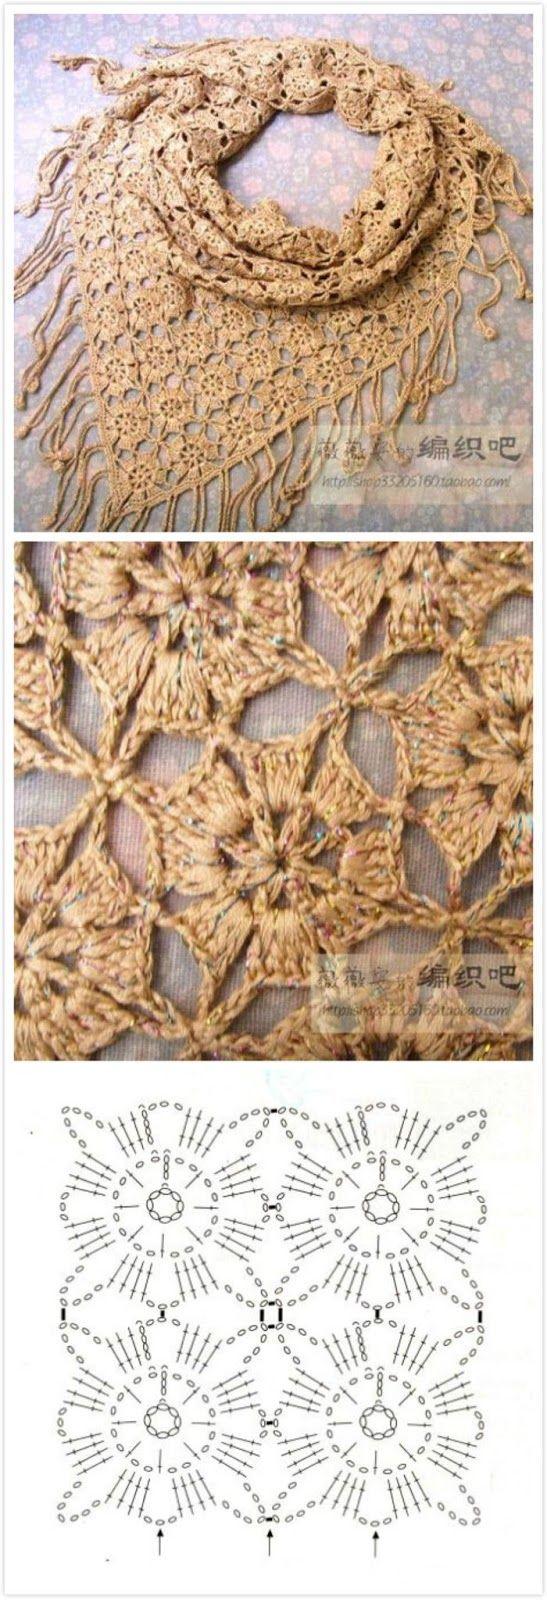 Luty Artes Crochet: Xale em crochê + Gráfico.